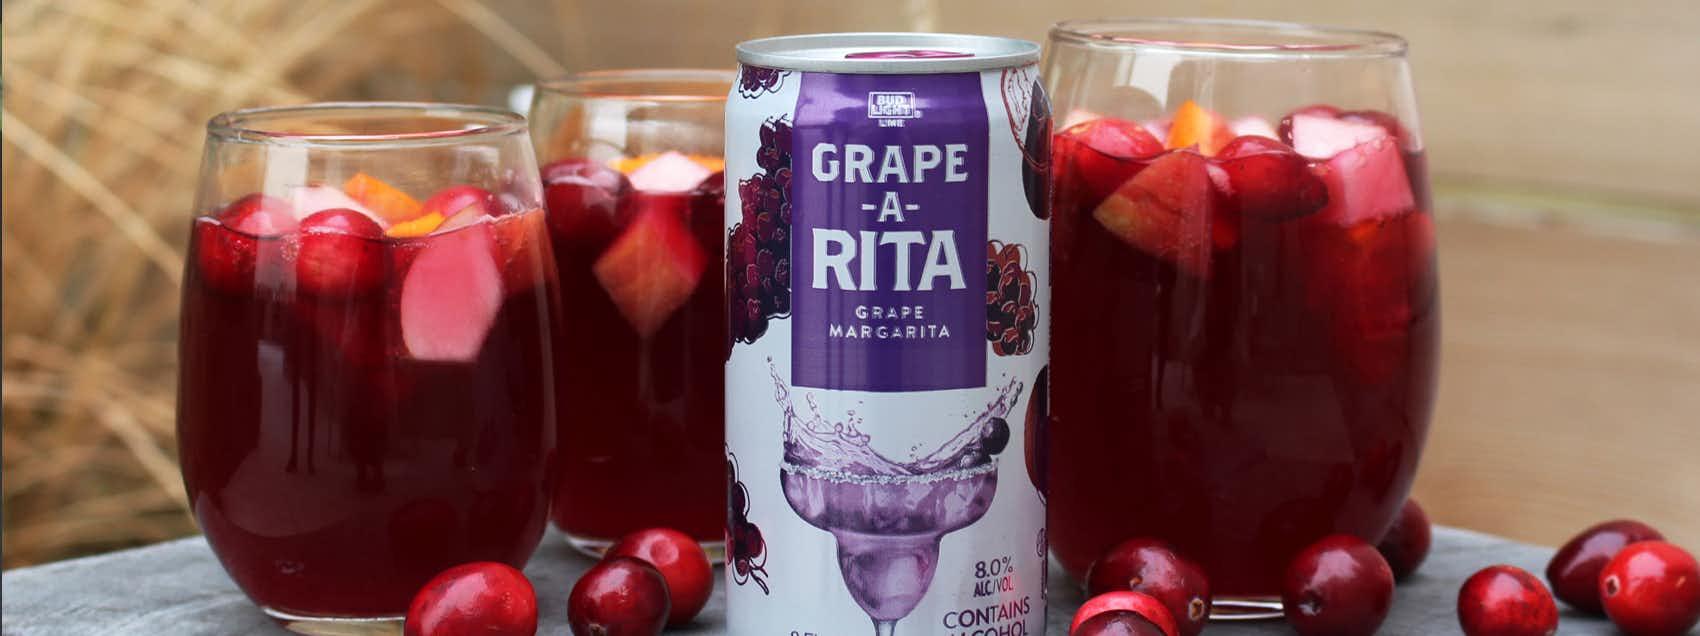 Grape-A-Rita Sangria